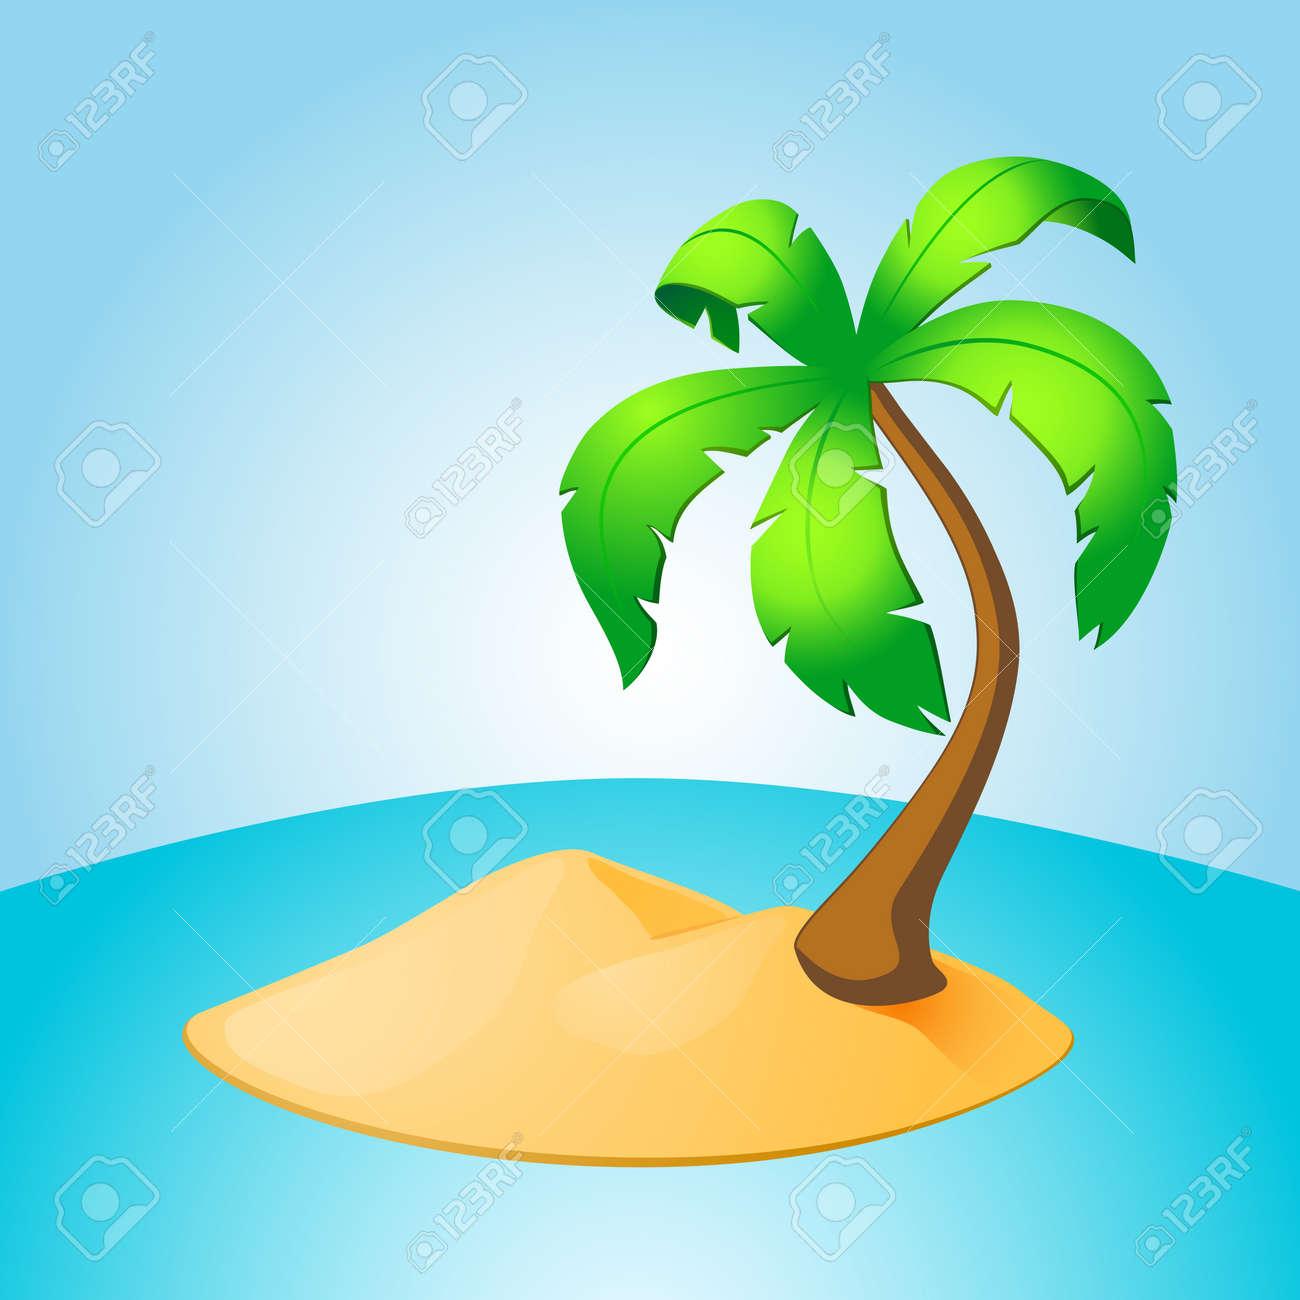 Palm tree island. EPS10 vector. - 38859681